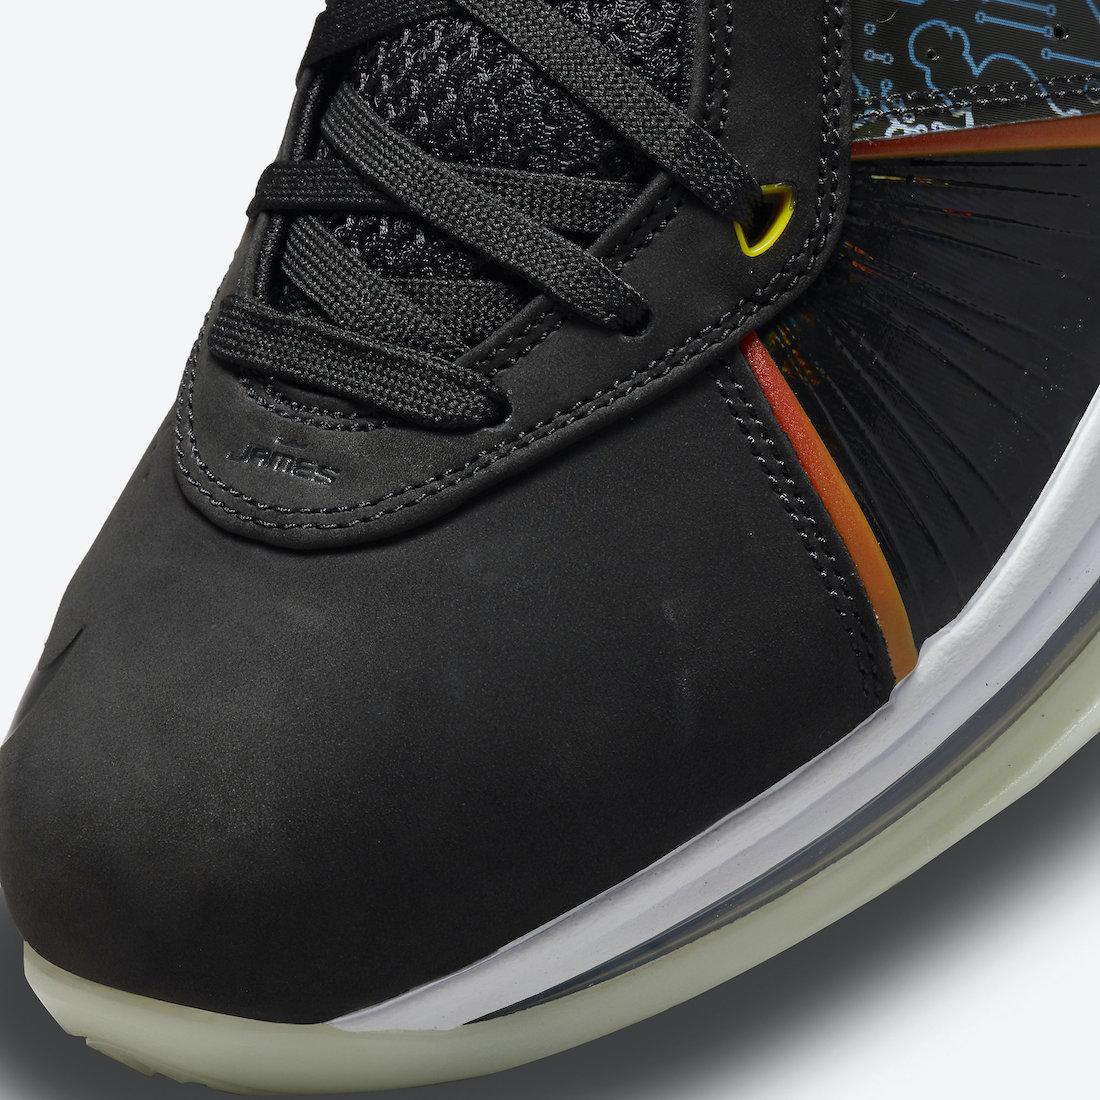 Nike-LeBron-8-Space-Jam-DB1732-001-Release-Date-6-1